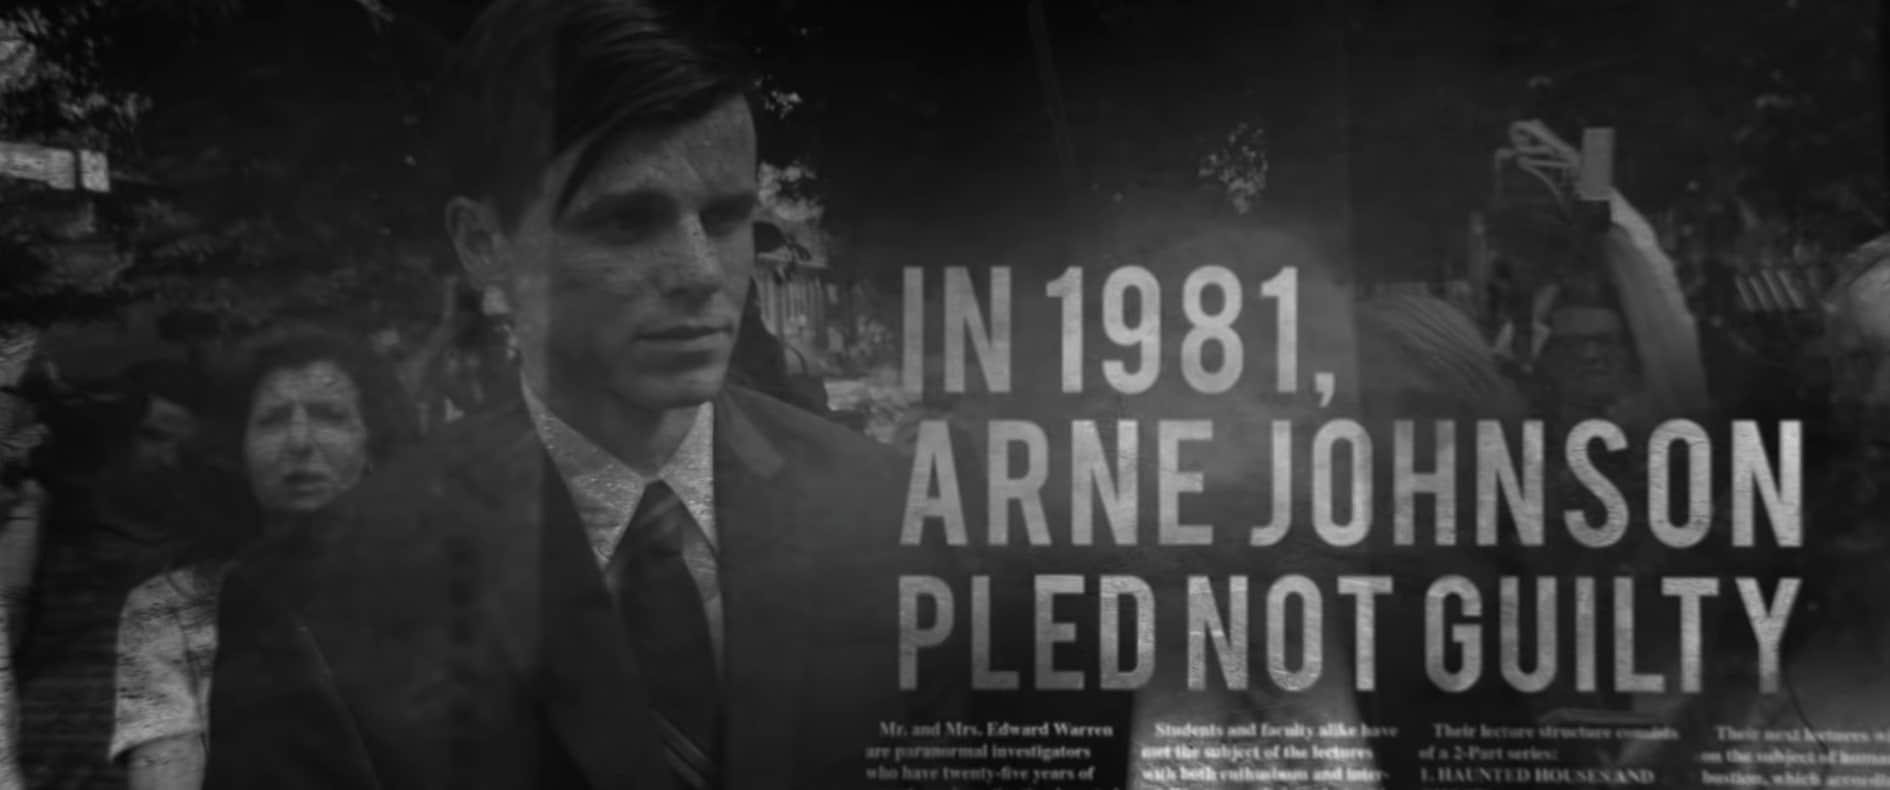 Rechtszaak van Arne C. Johnson in The Conjuring: the devil made me do it